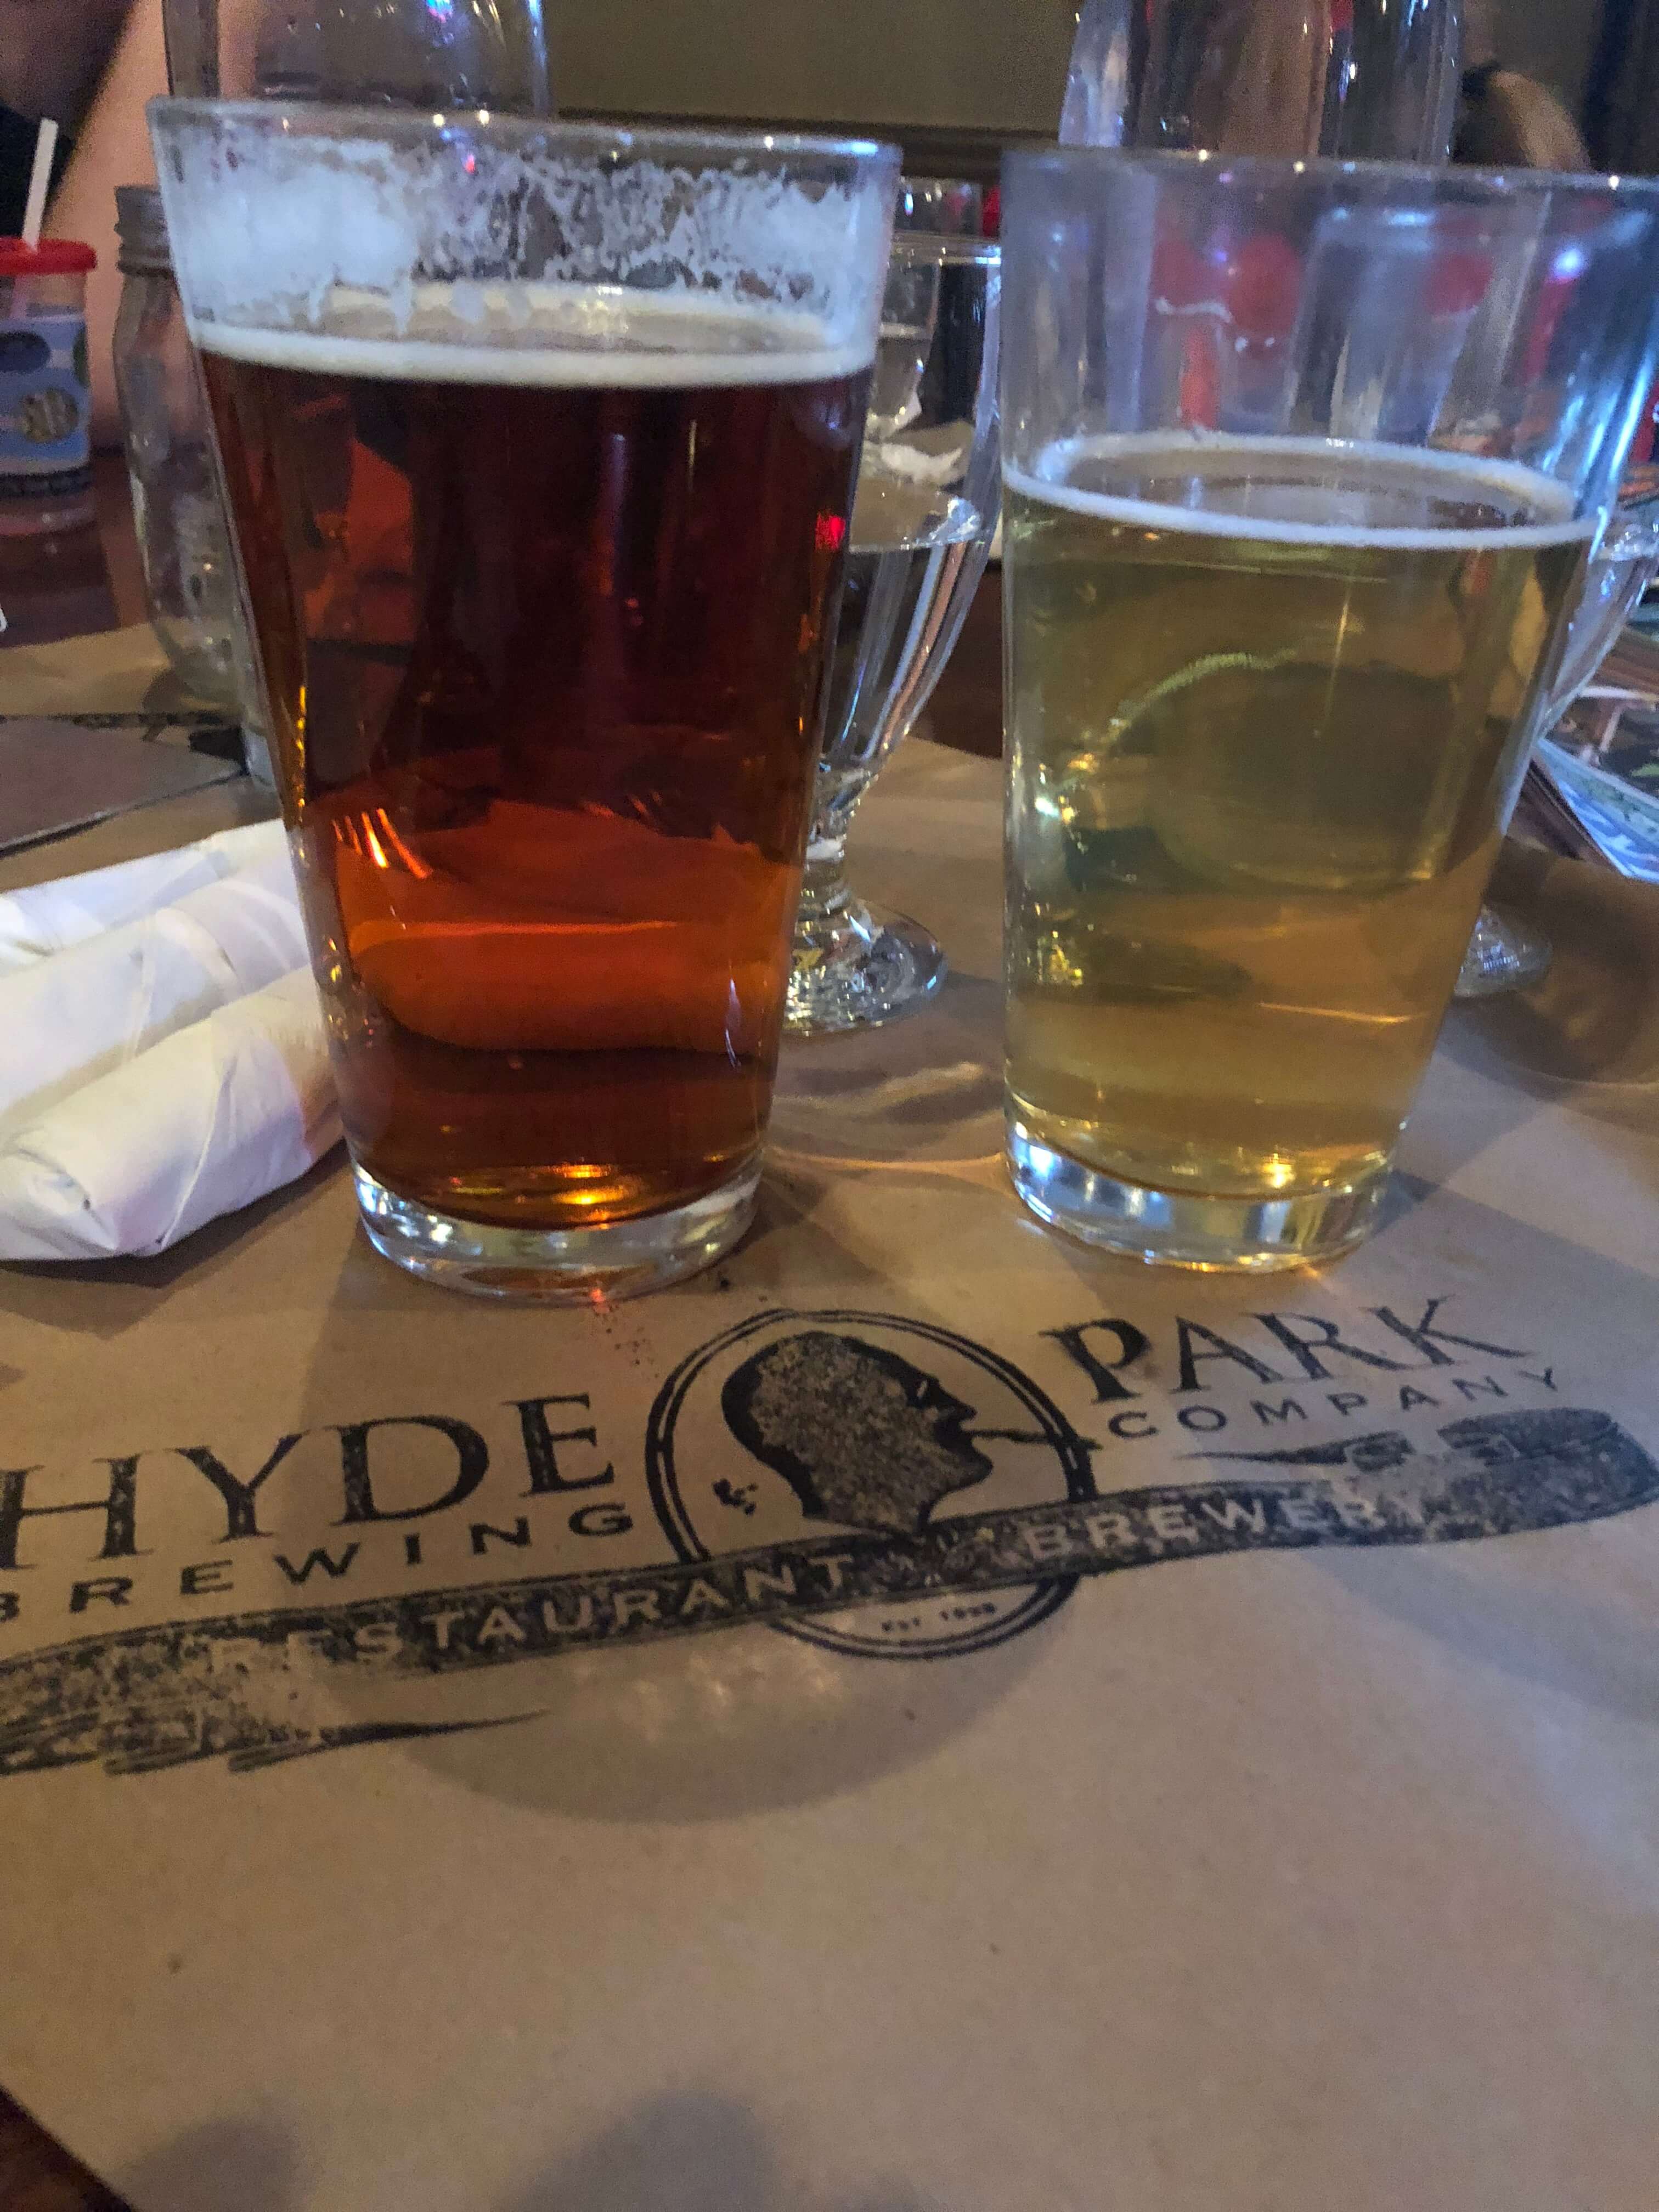 hyde park brewery dutchessc county